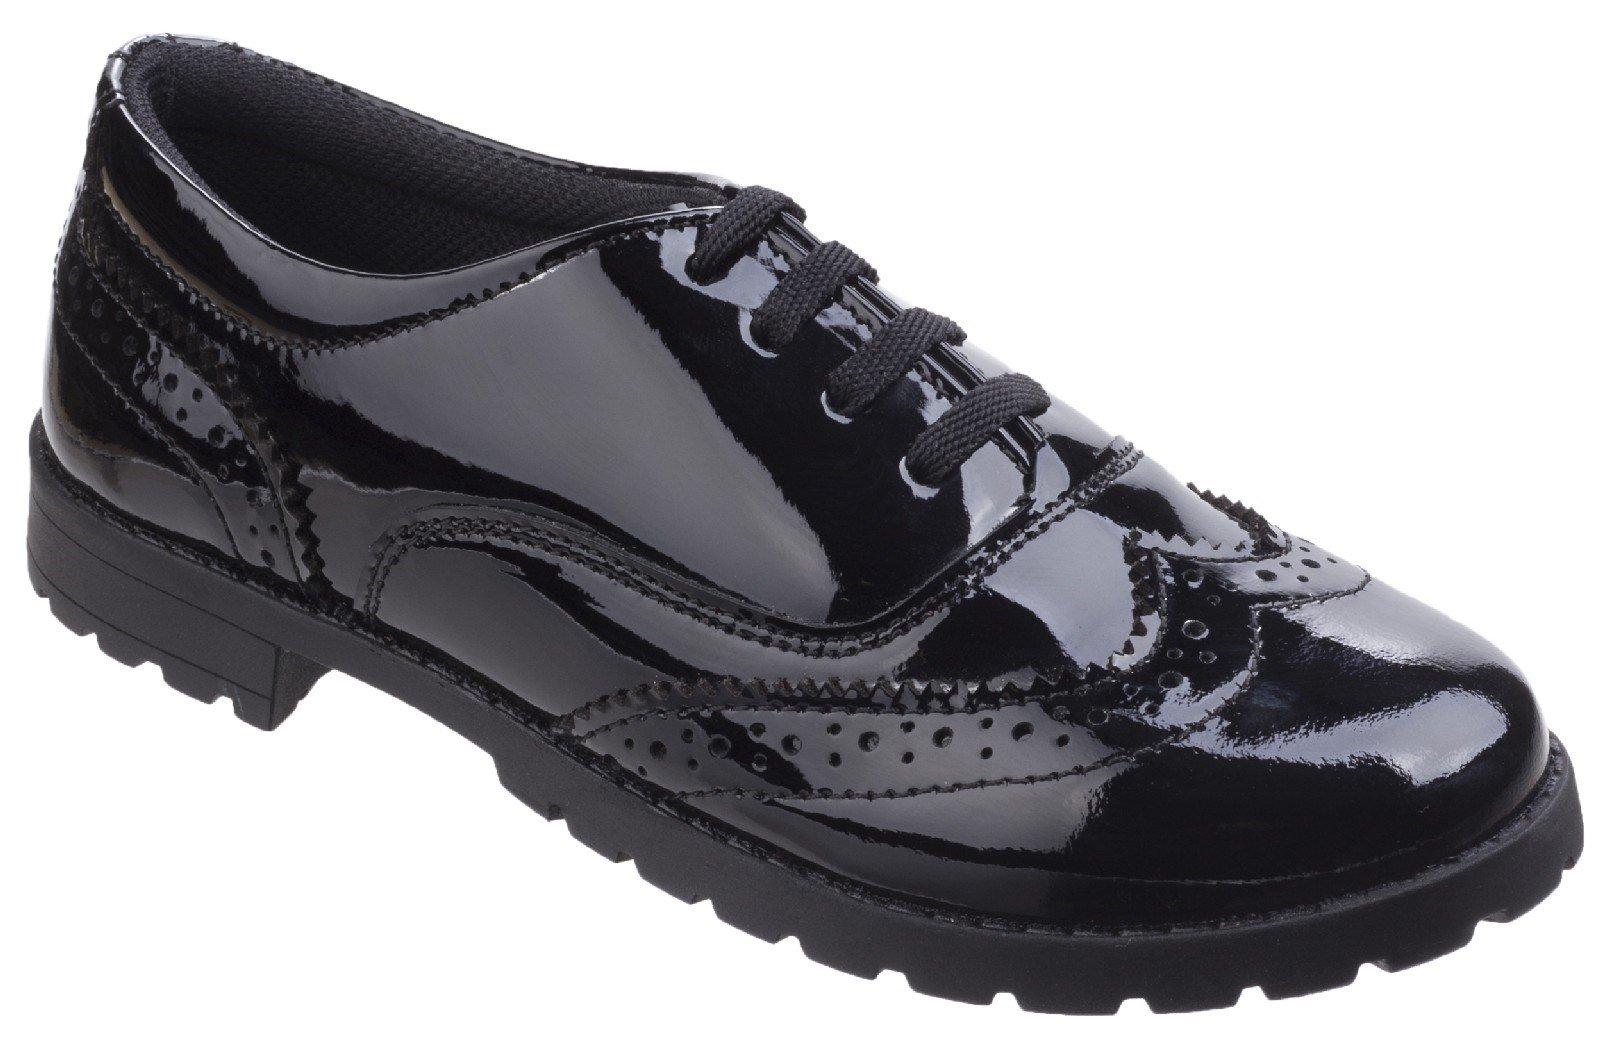 Hush Puppies Men's Eadie Jnr Brogue Shoe Black 27077 - Black 2 UK